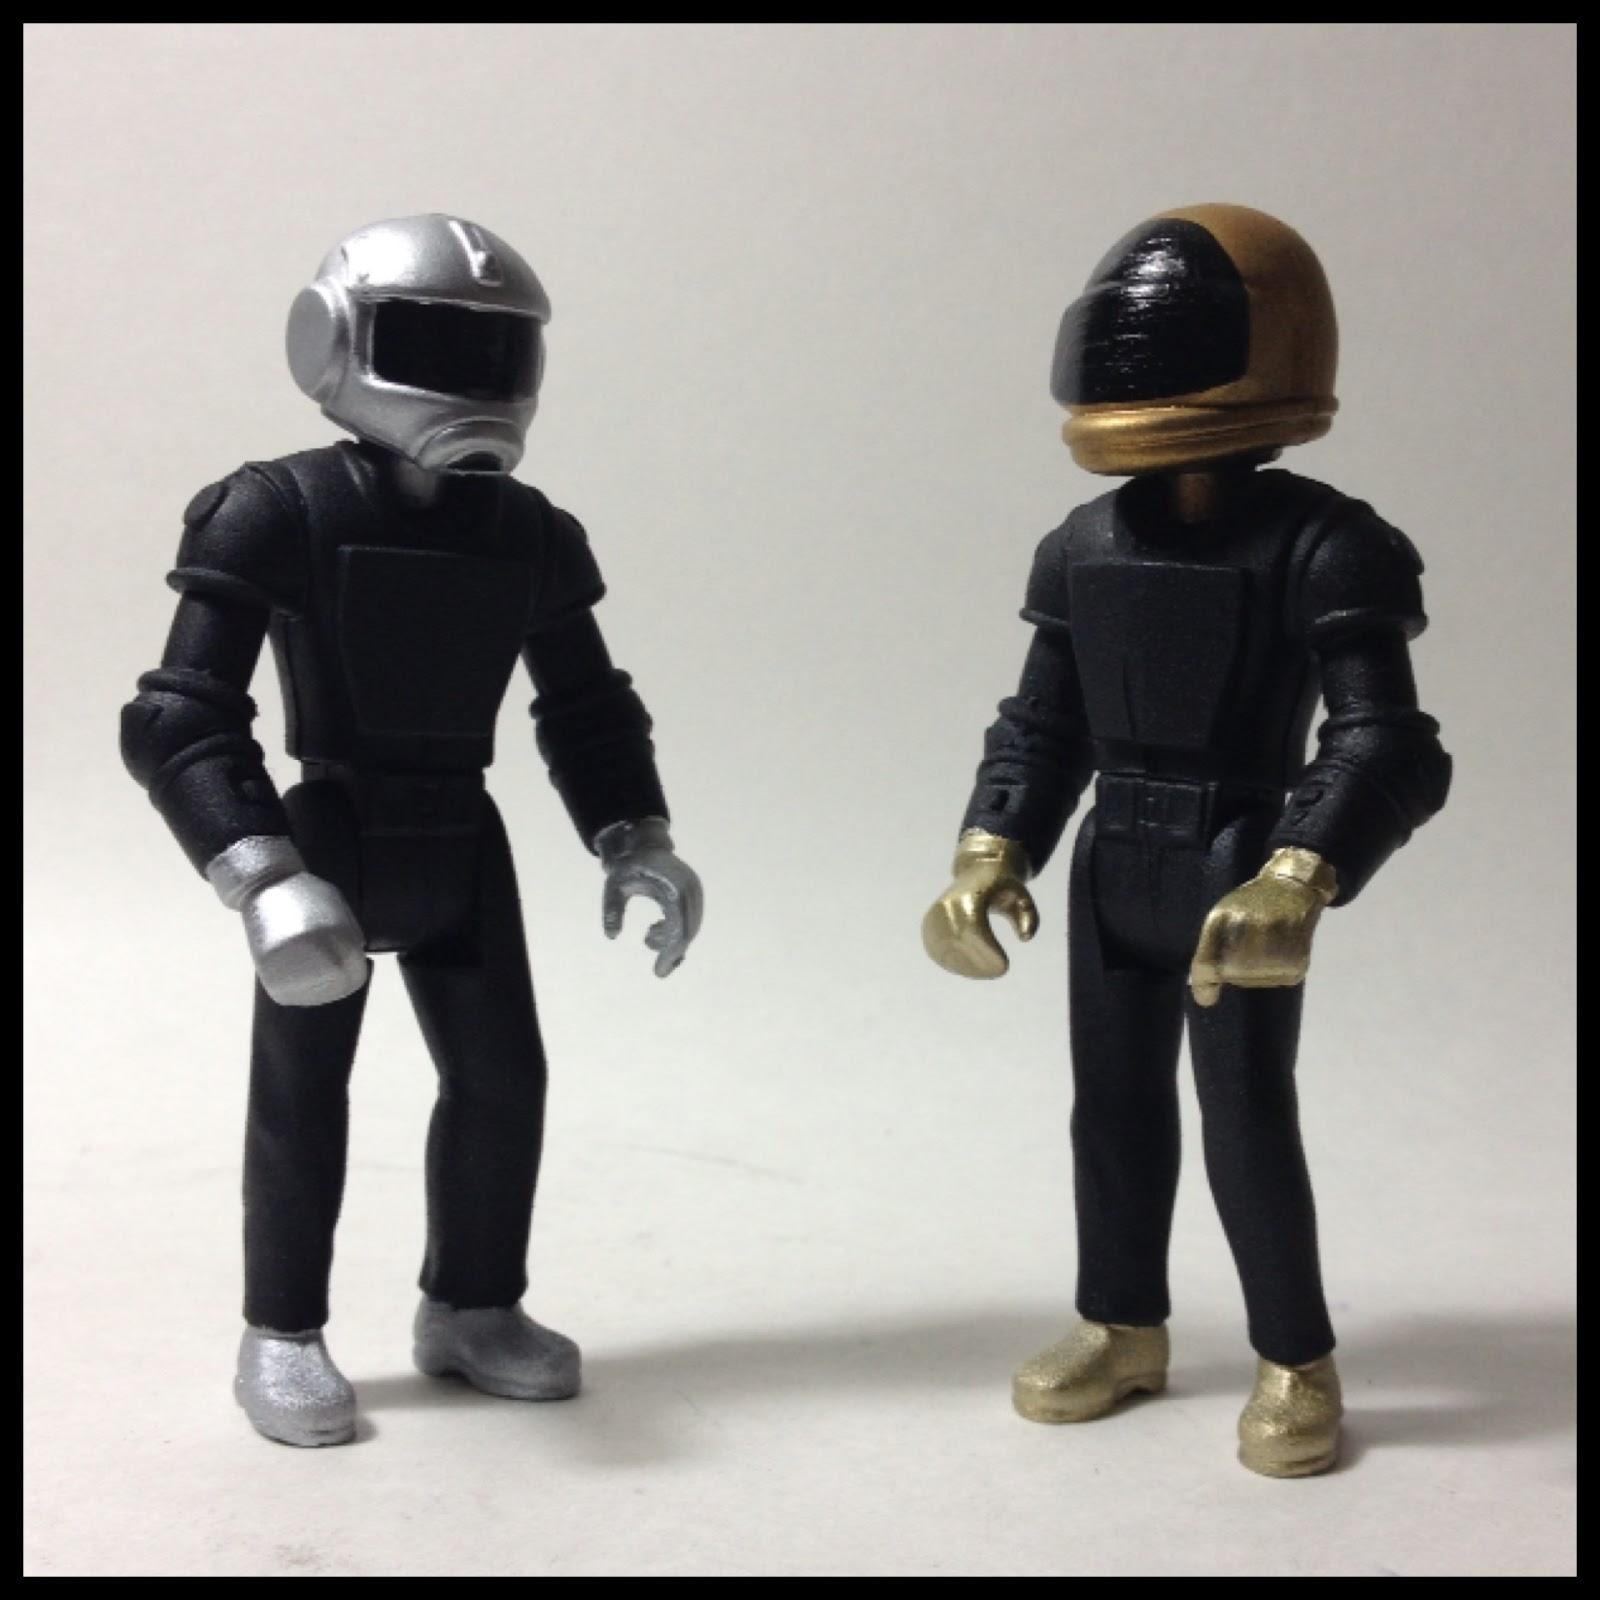 MUSIC SHOCKER: Daft Punk digs hole, throws in spade, jumps in, keeps digging - 2019 year